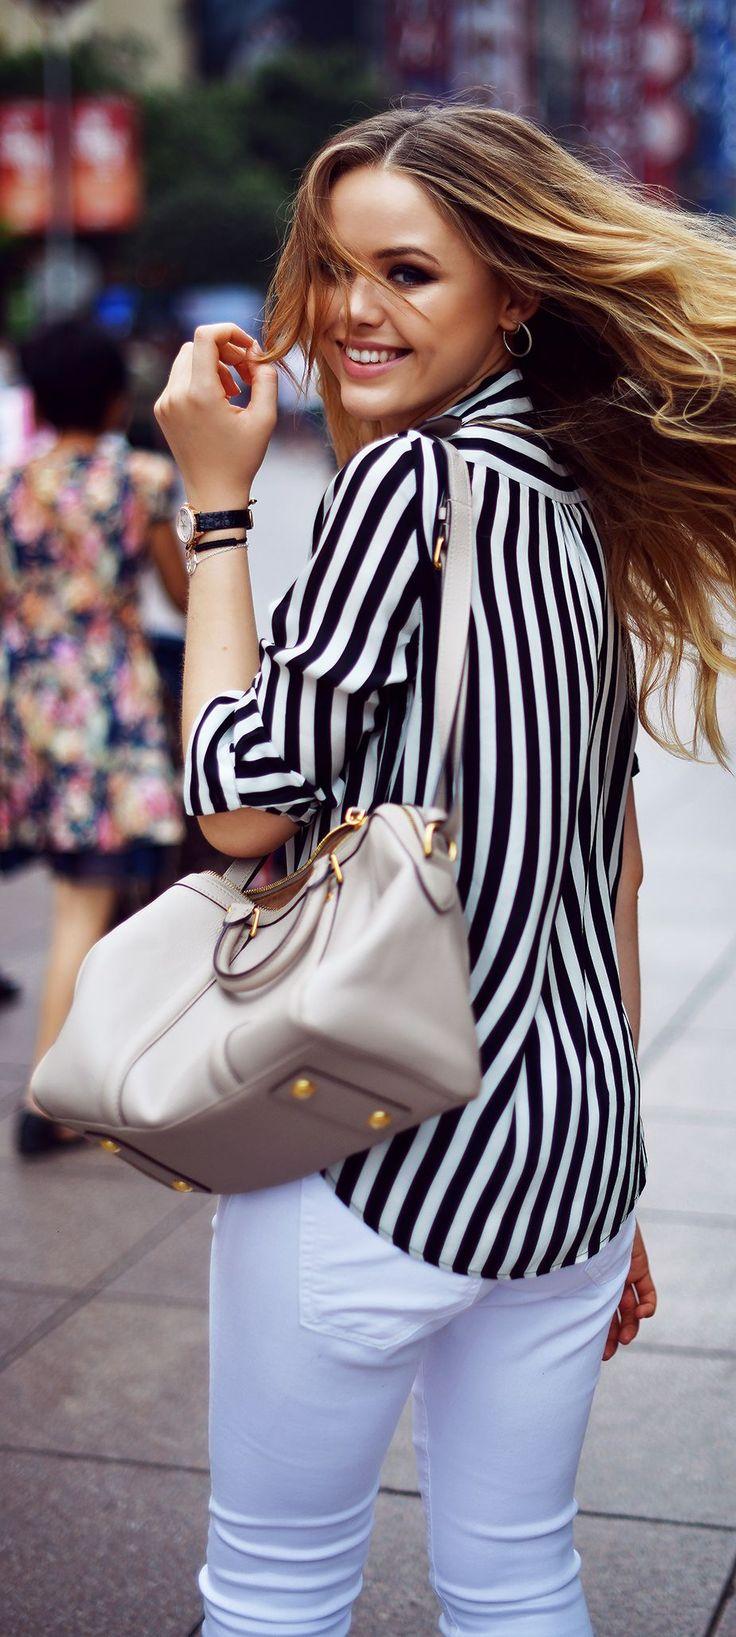 Zara Black And White Stripe Blouse by Kayture